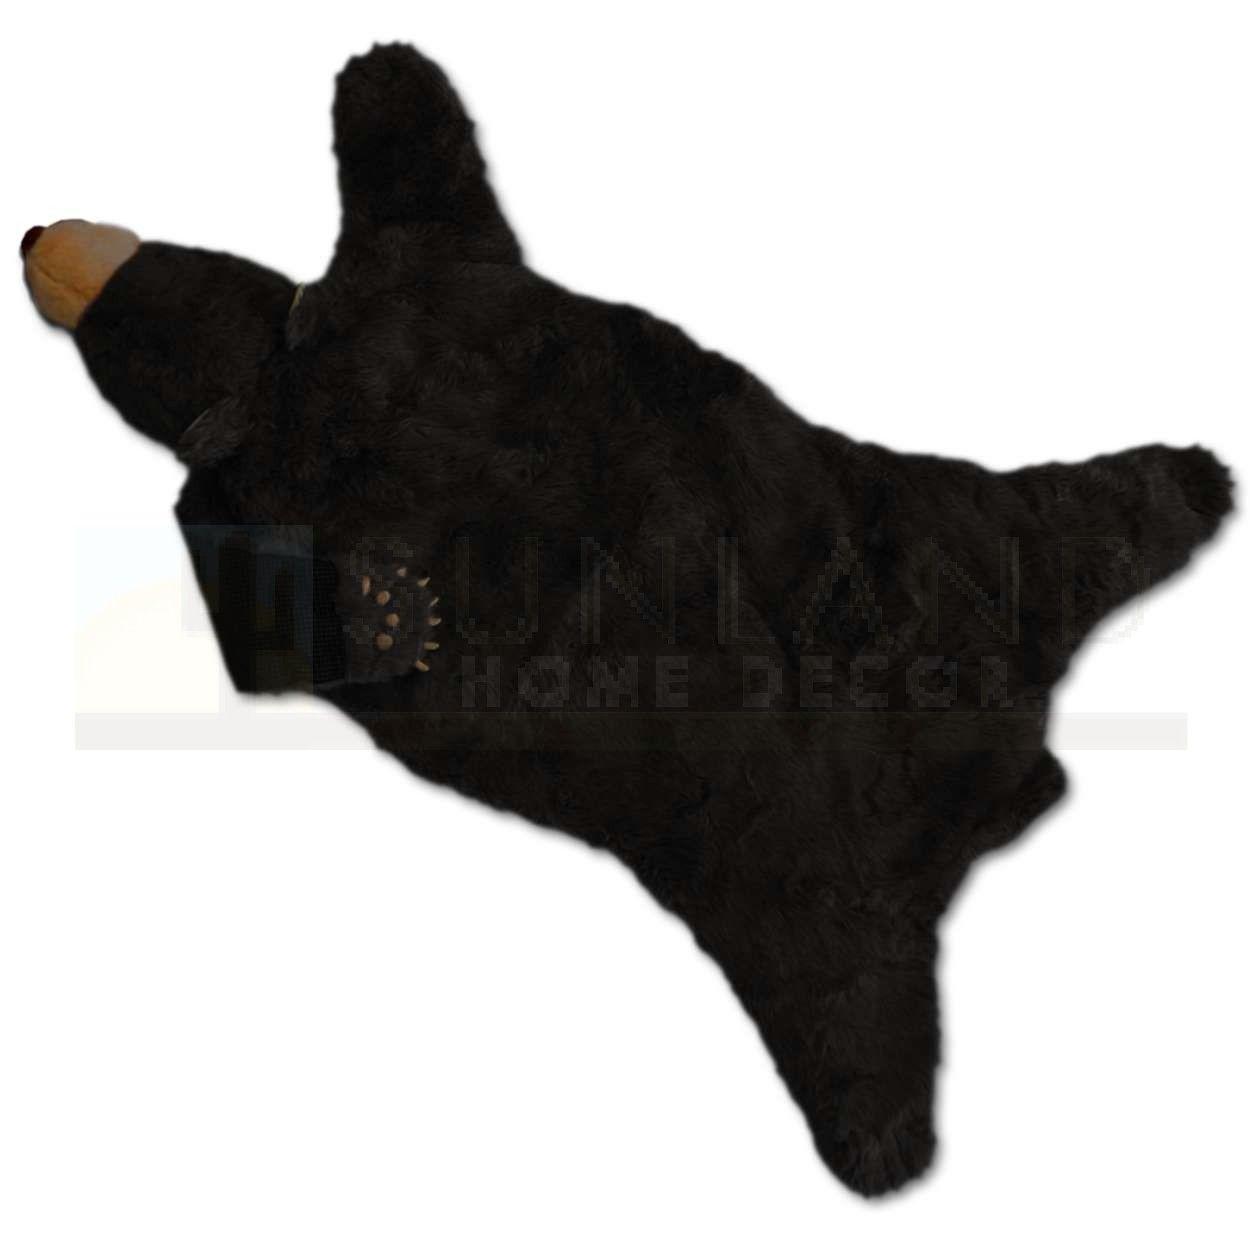 Sunland Home Decor Br101 Plush Animal Rug 58in Black Bear